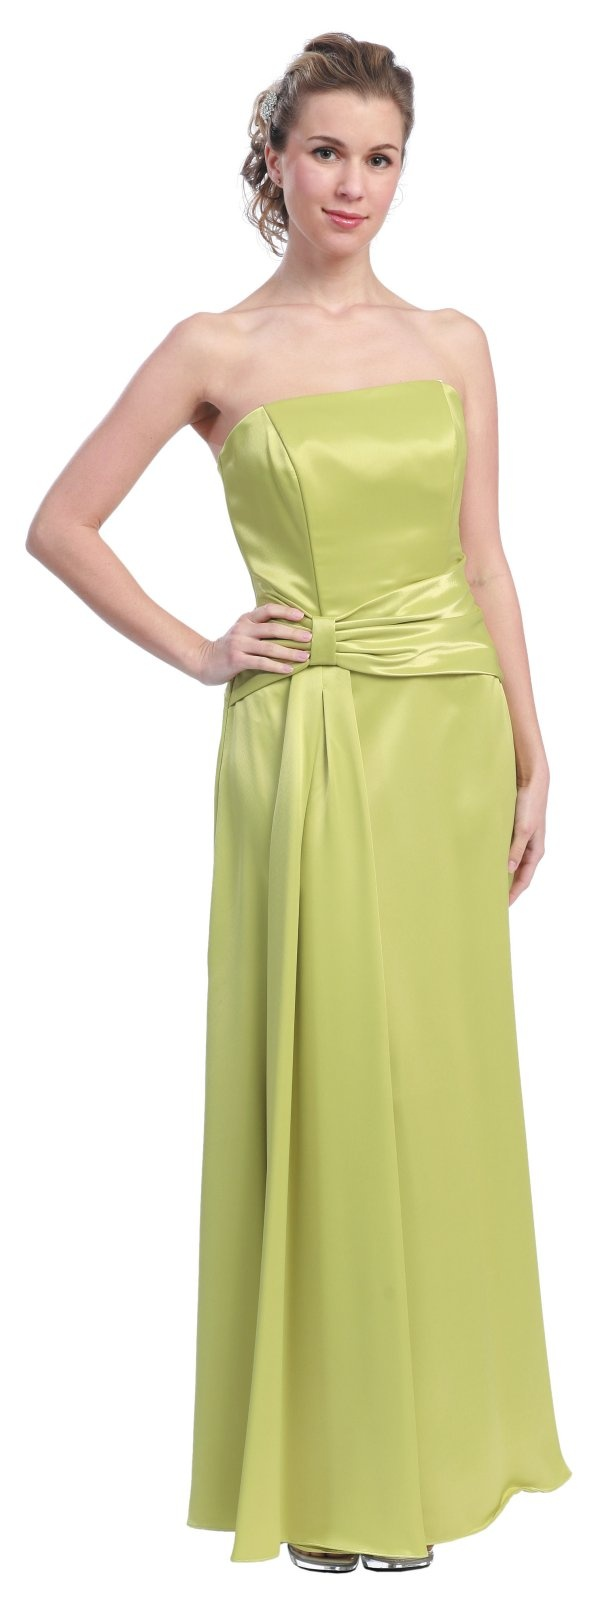 Light Green Formal Dress Cheap Strapless Green Prom Bridesmaid Gown $92.99